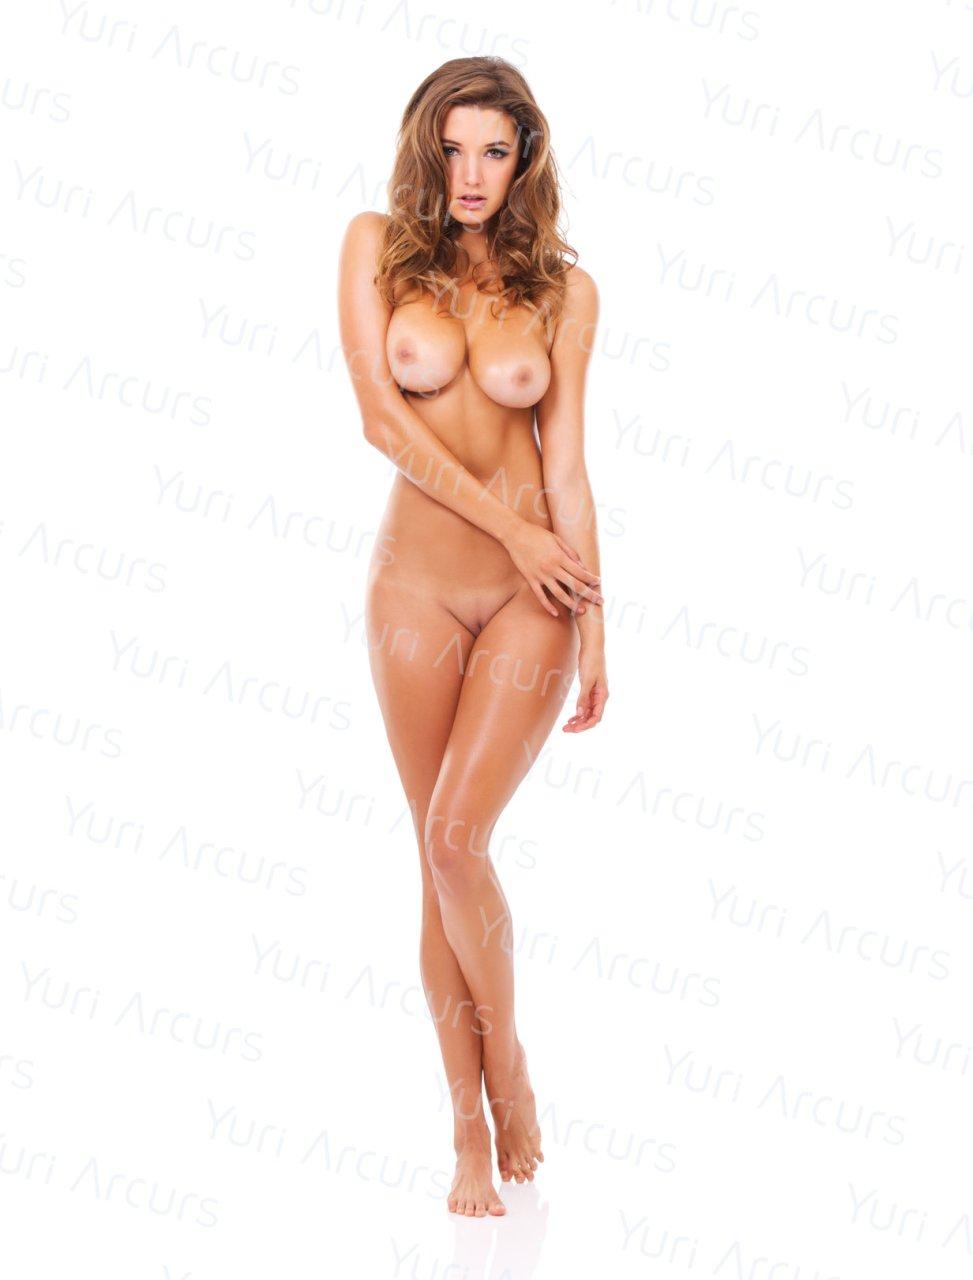 Alyssa Arce Sex pretty and big breasted alyssa makes her debut at ftv girls